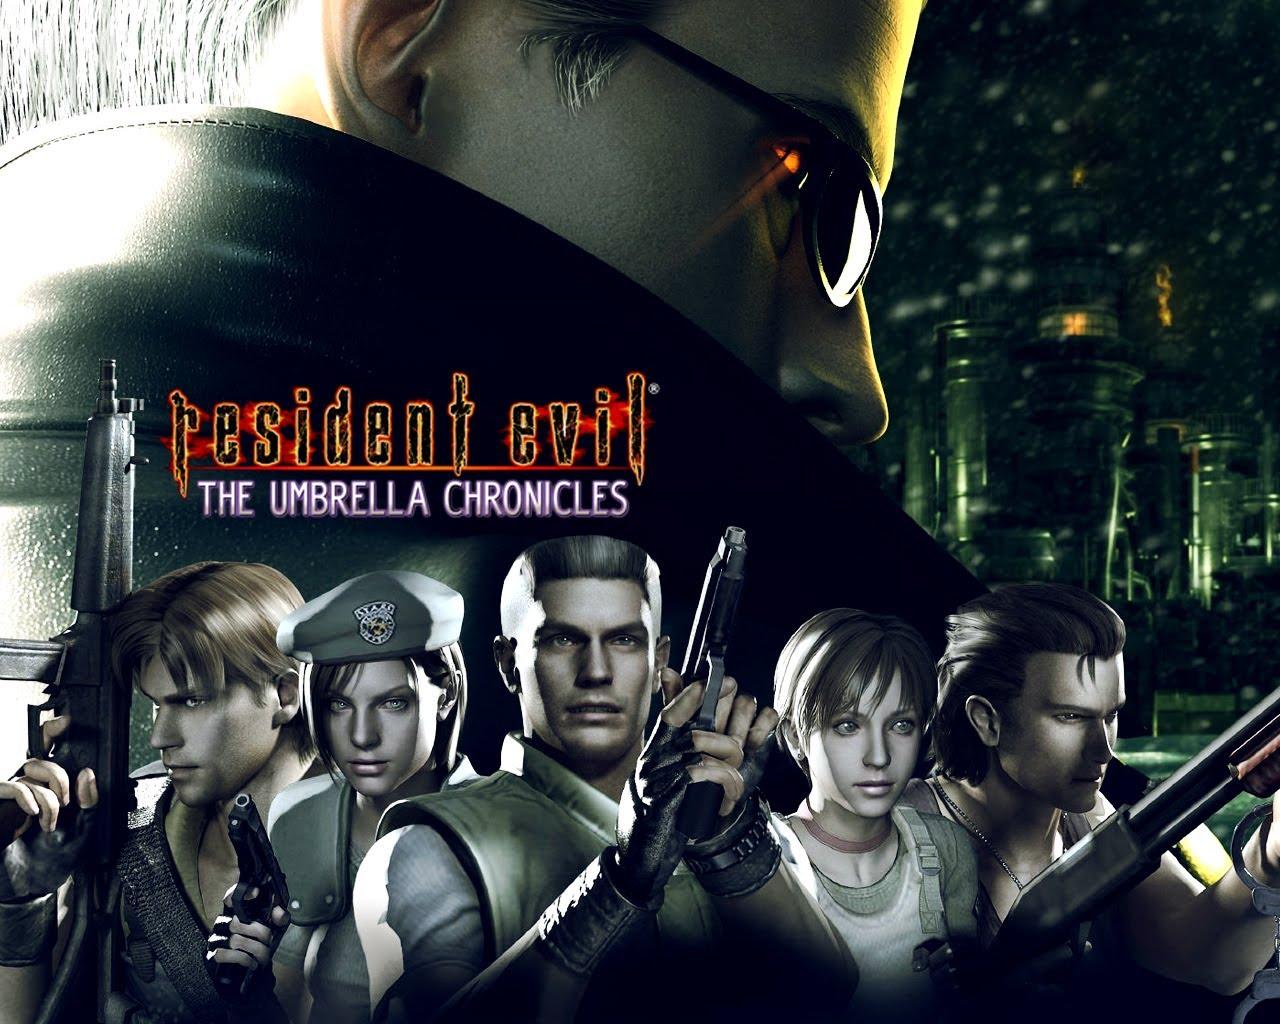 Resident Evil The Umbrella Chronicles – Wii